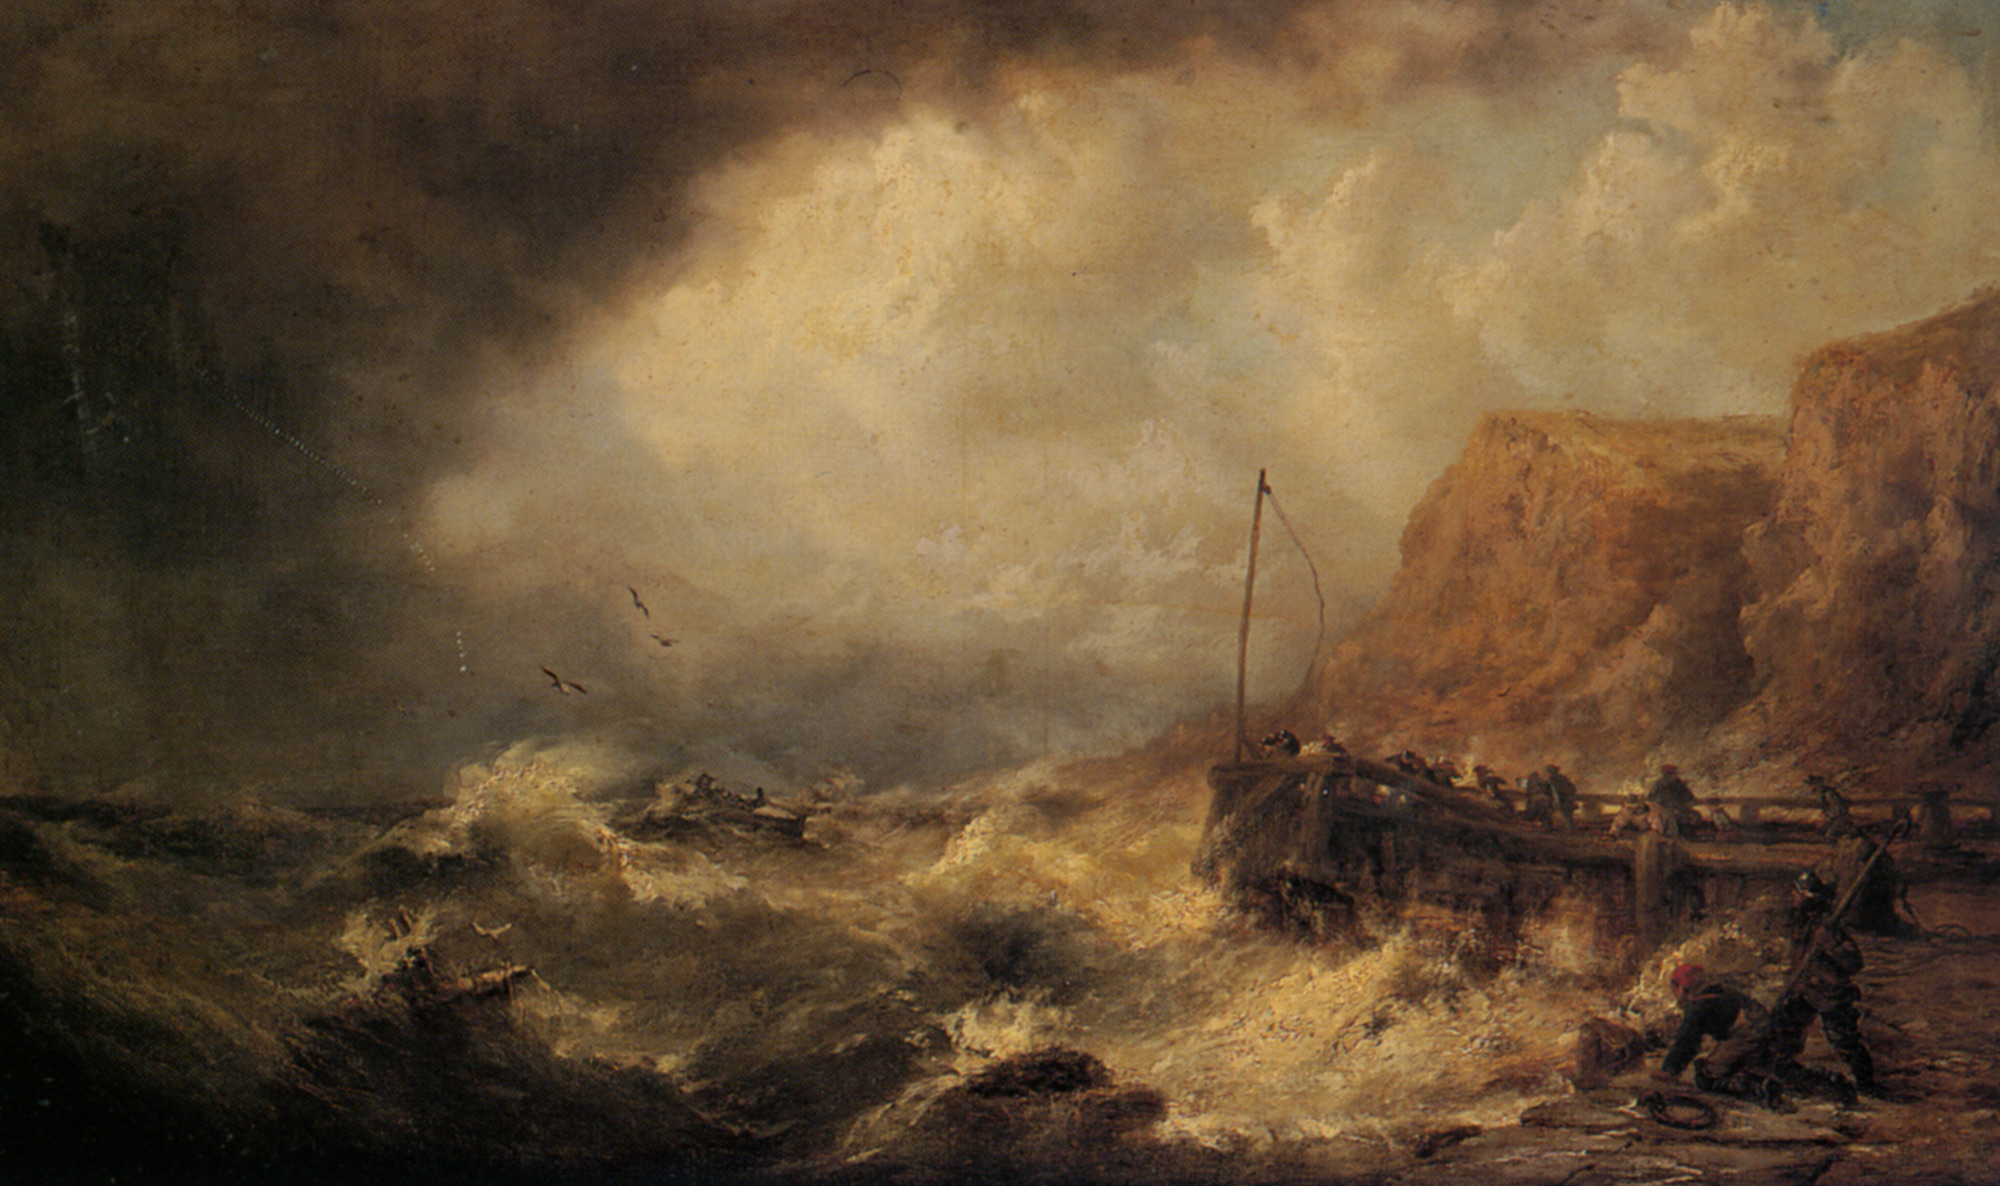 Shipwrecked :: James Webb - Sea landscapes with ships ôîòî